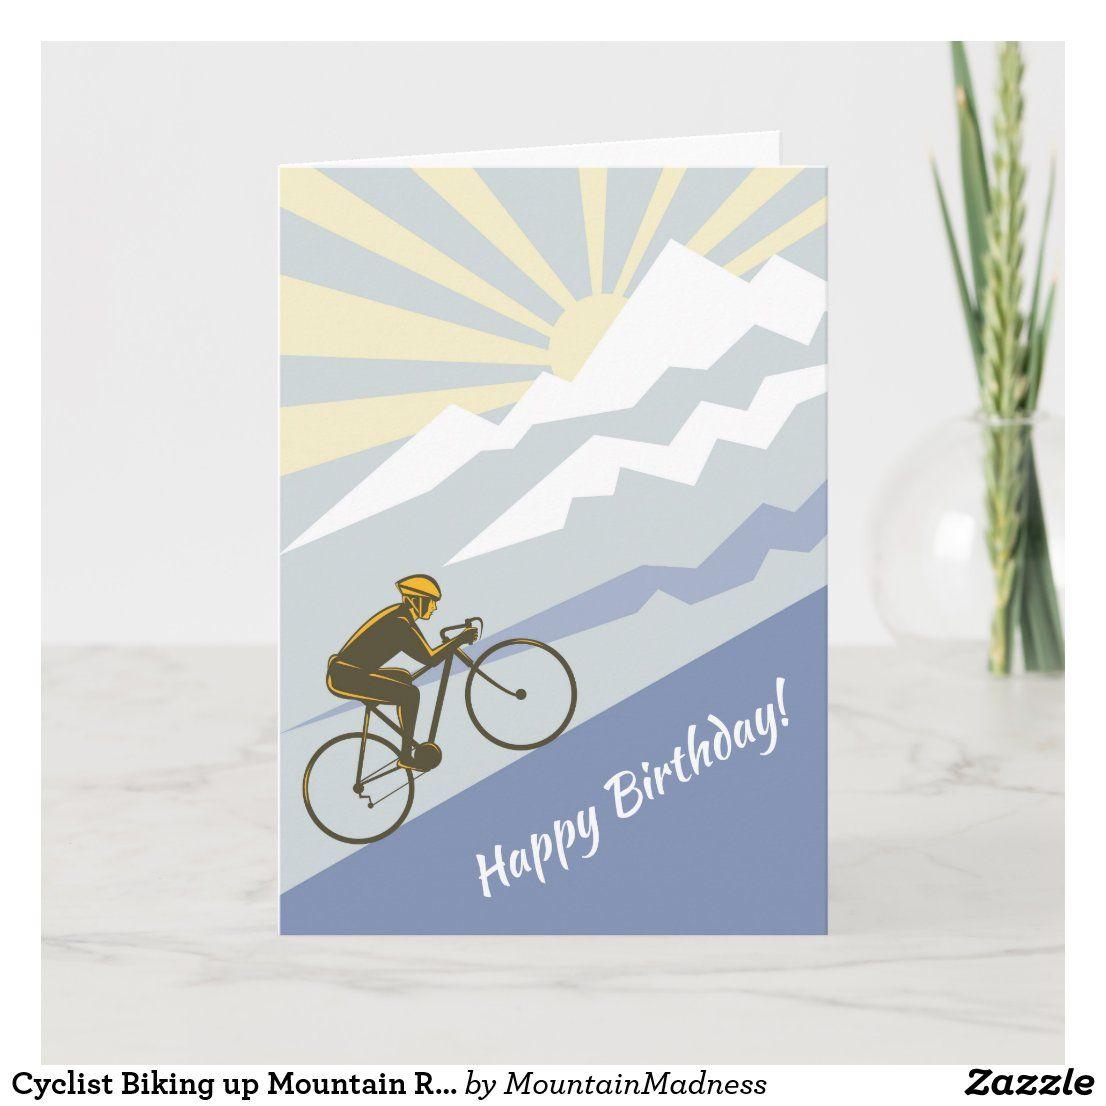 Cyclist Biking Up Mountain Road Bike Birthday Card Zazzle Com In 2021 Birthday Cards Cards Bike Card